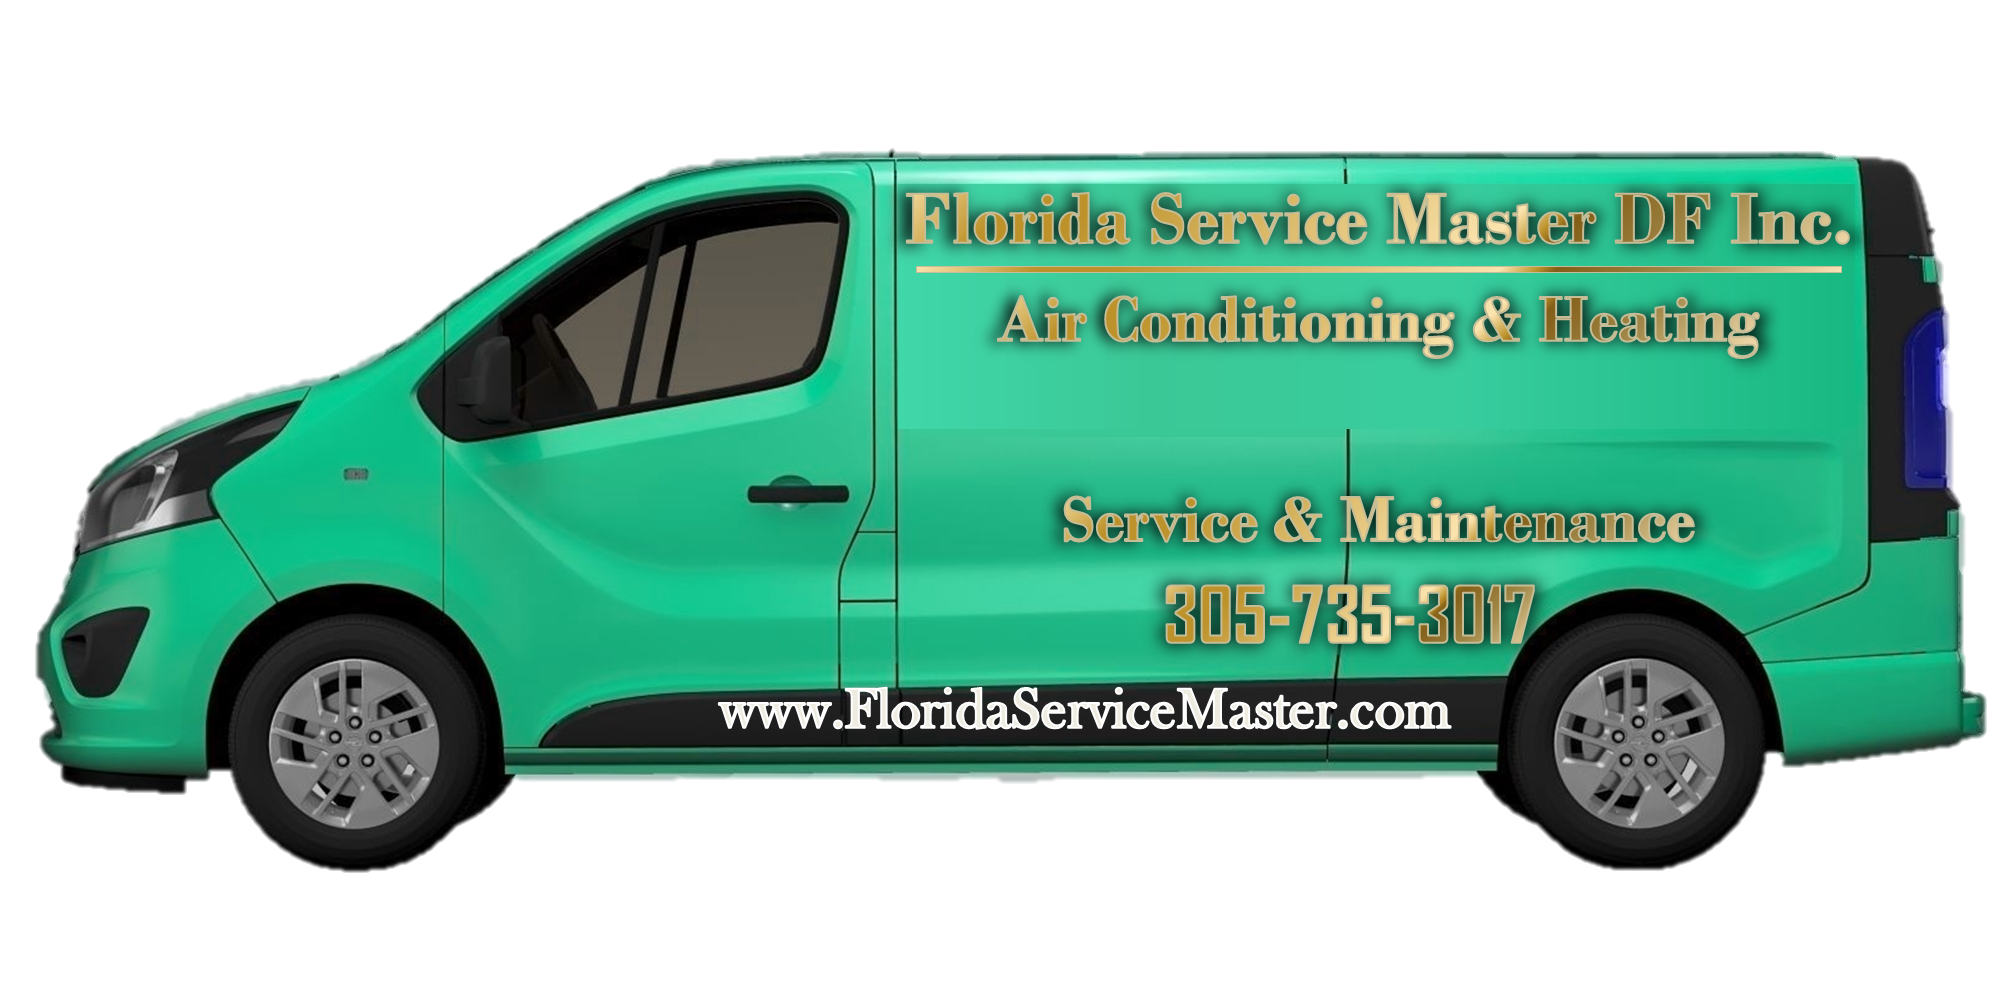 Florida-Service-Master